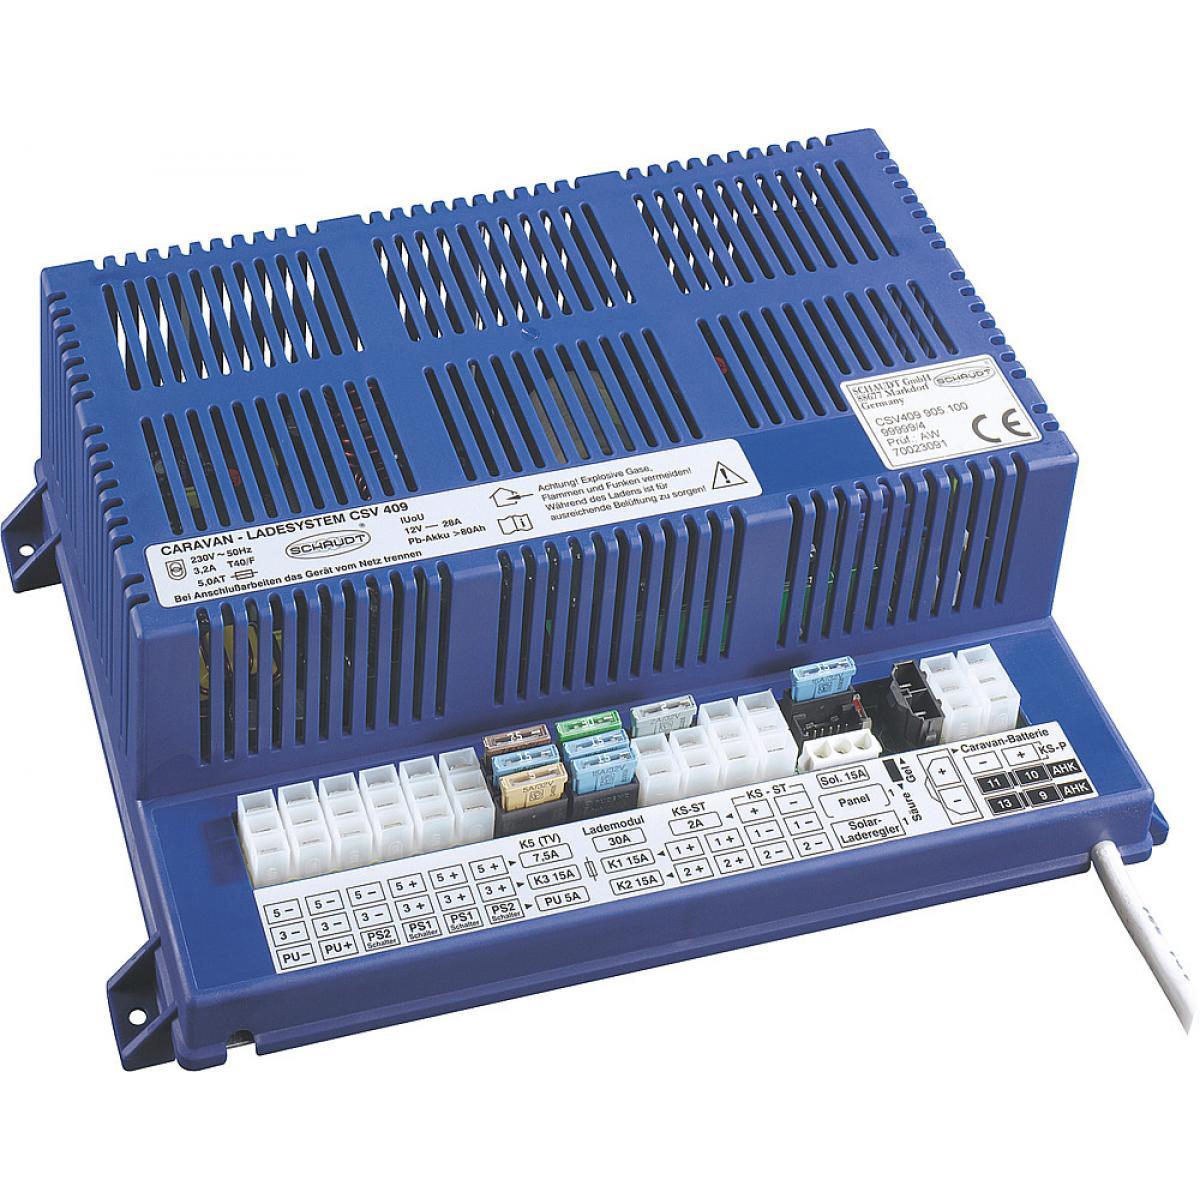 Stromversorgungsgerät CSV 409 A